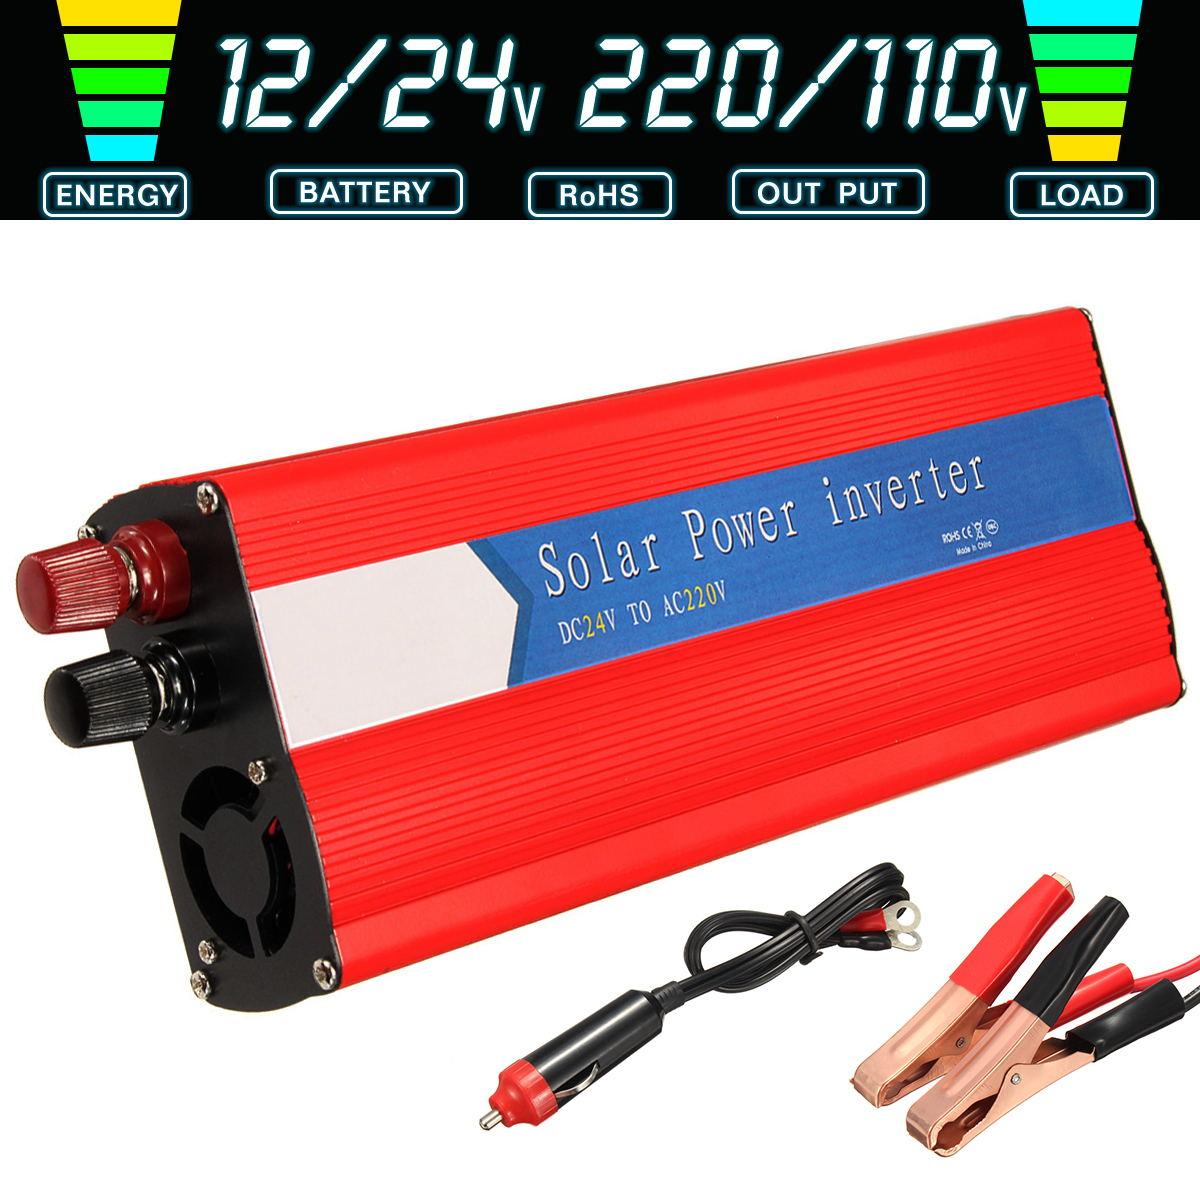 6000W Power Inverter Modified Sine Wave LCD Display DC 12V/24V To AC 110V/220V Solar 2 USB Car Transformer Convert With Plug